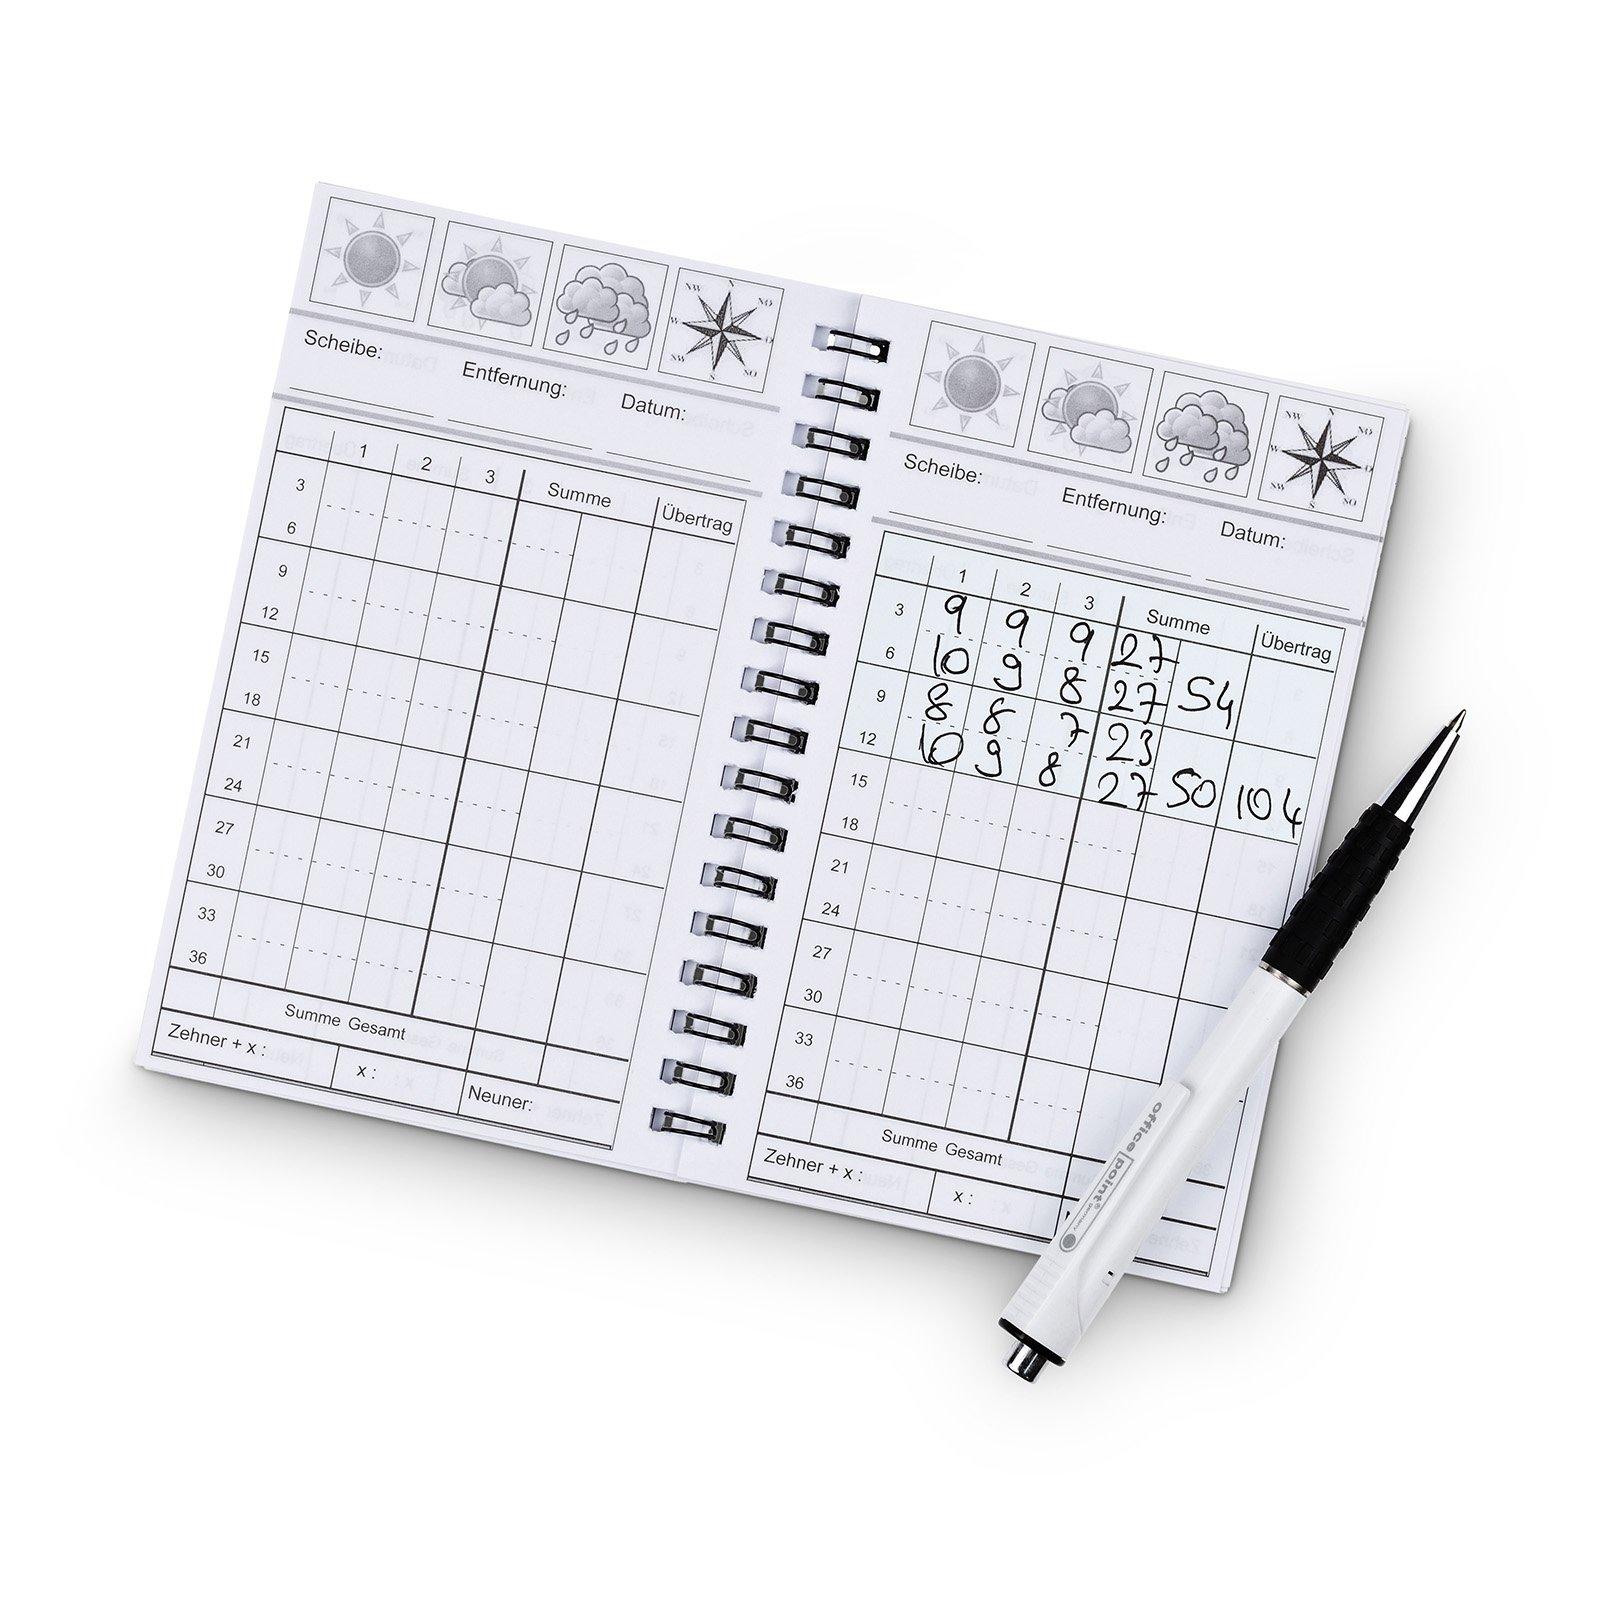 est Scorebook Schießbuch, Scorebook - est-bogensport.de